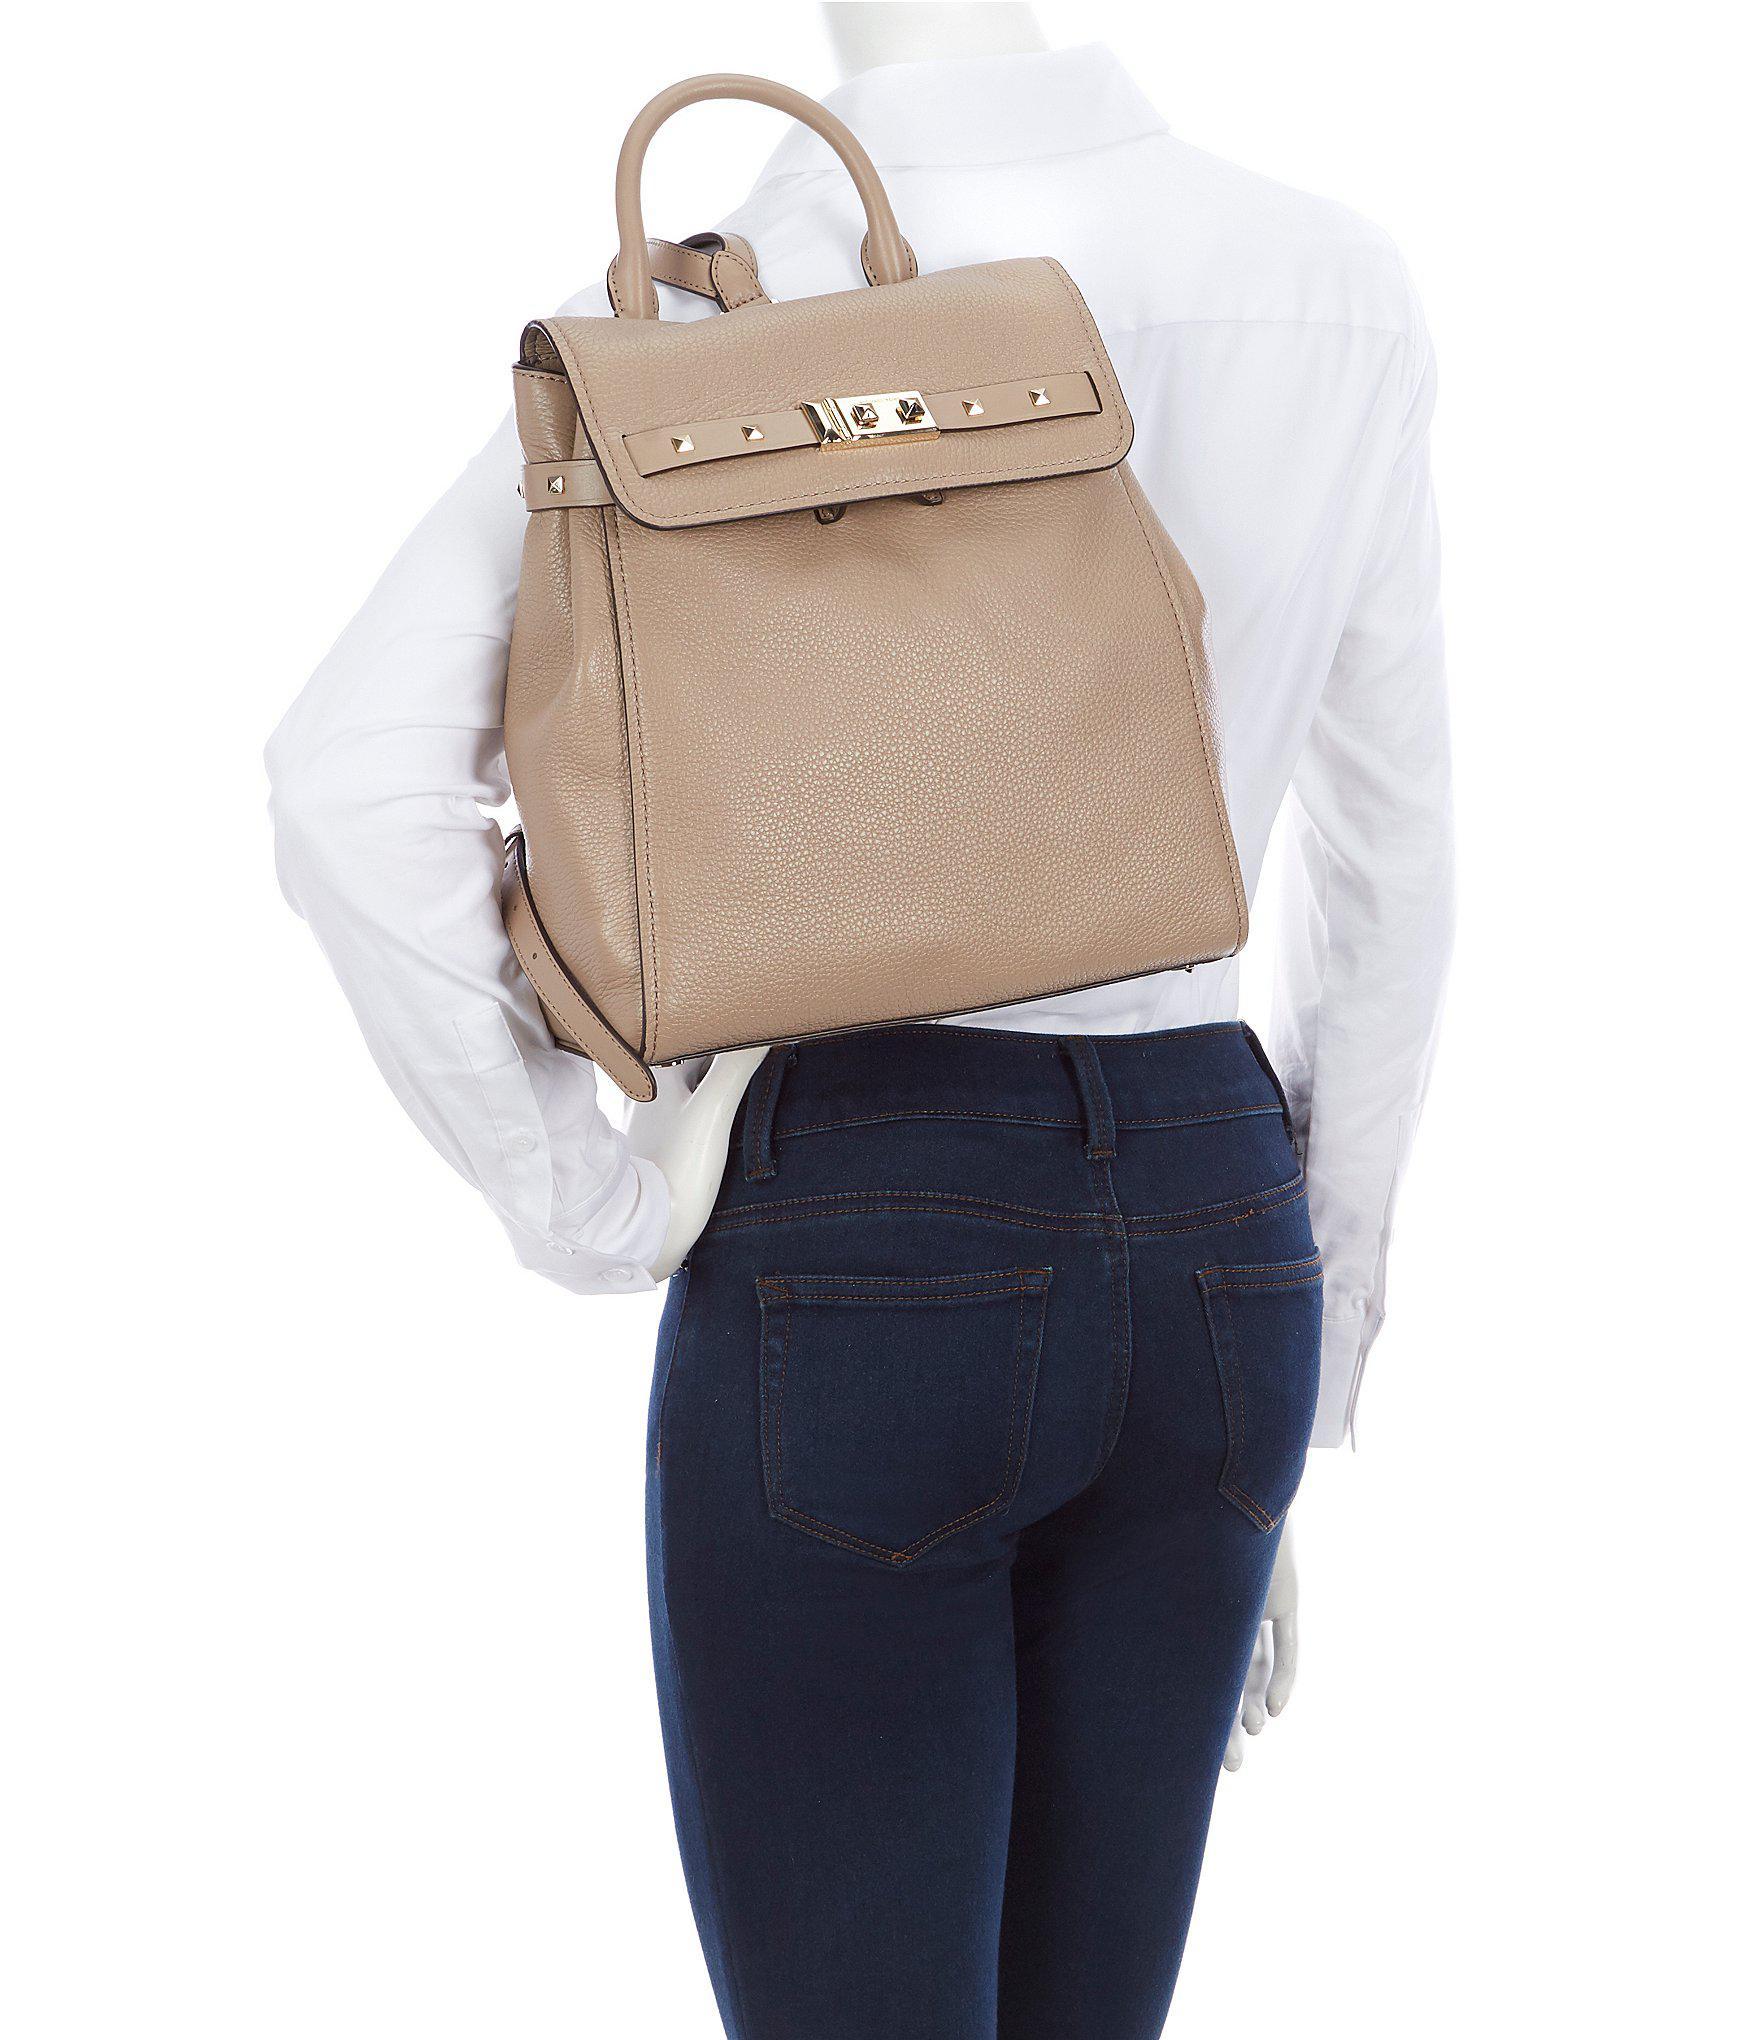 9abf388fd44d MICHAEL Michael Kors Addison Medium Leather Backpack in Black - Lyst